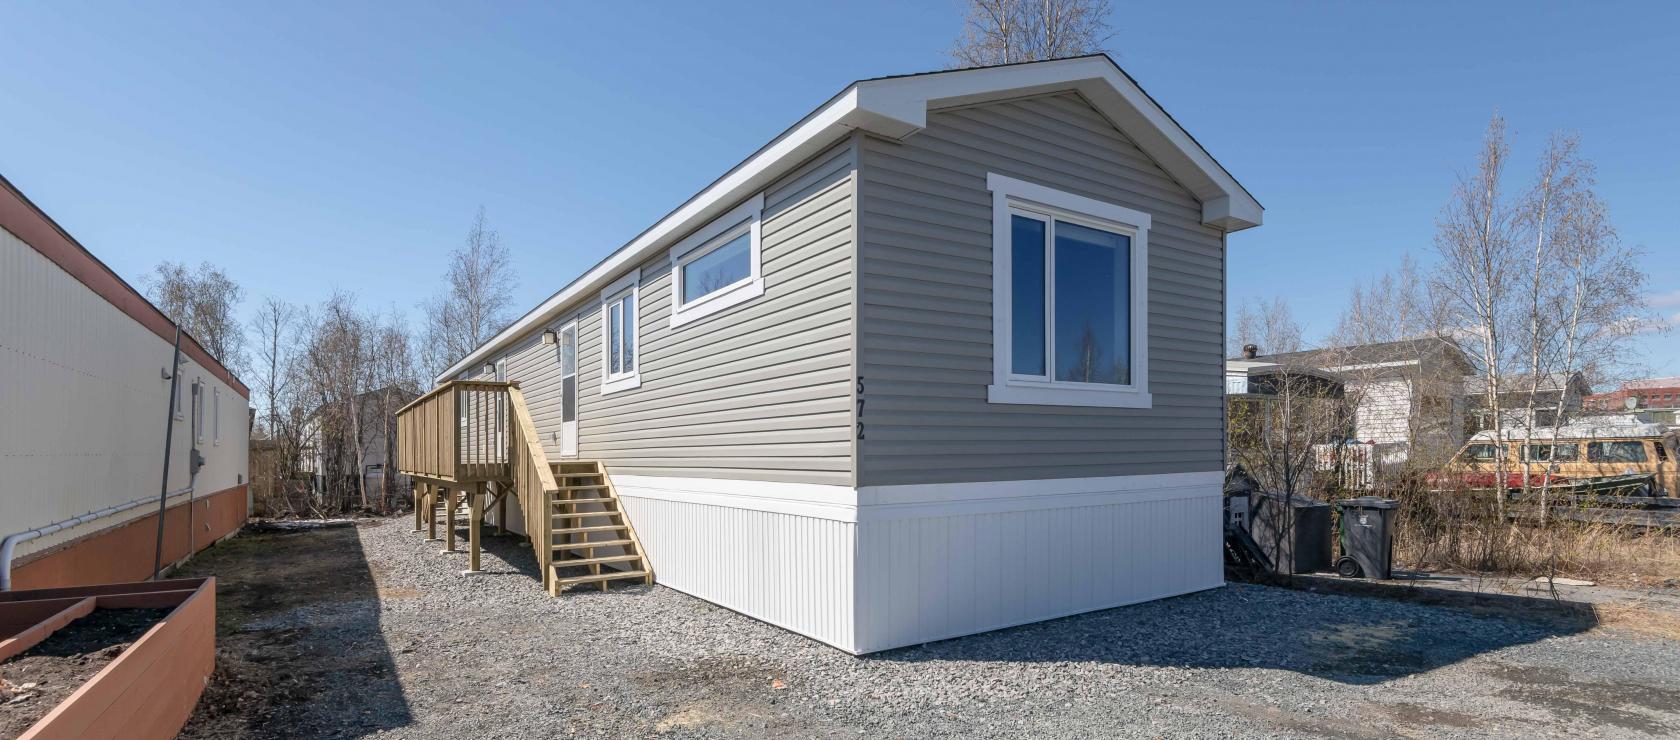 572 Catalina Drive, Frame Lake South, Yellowknife 2